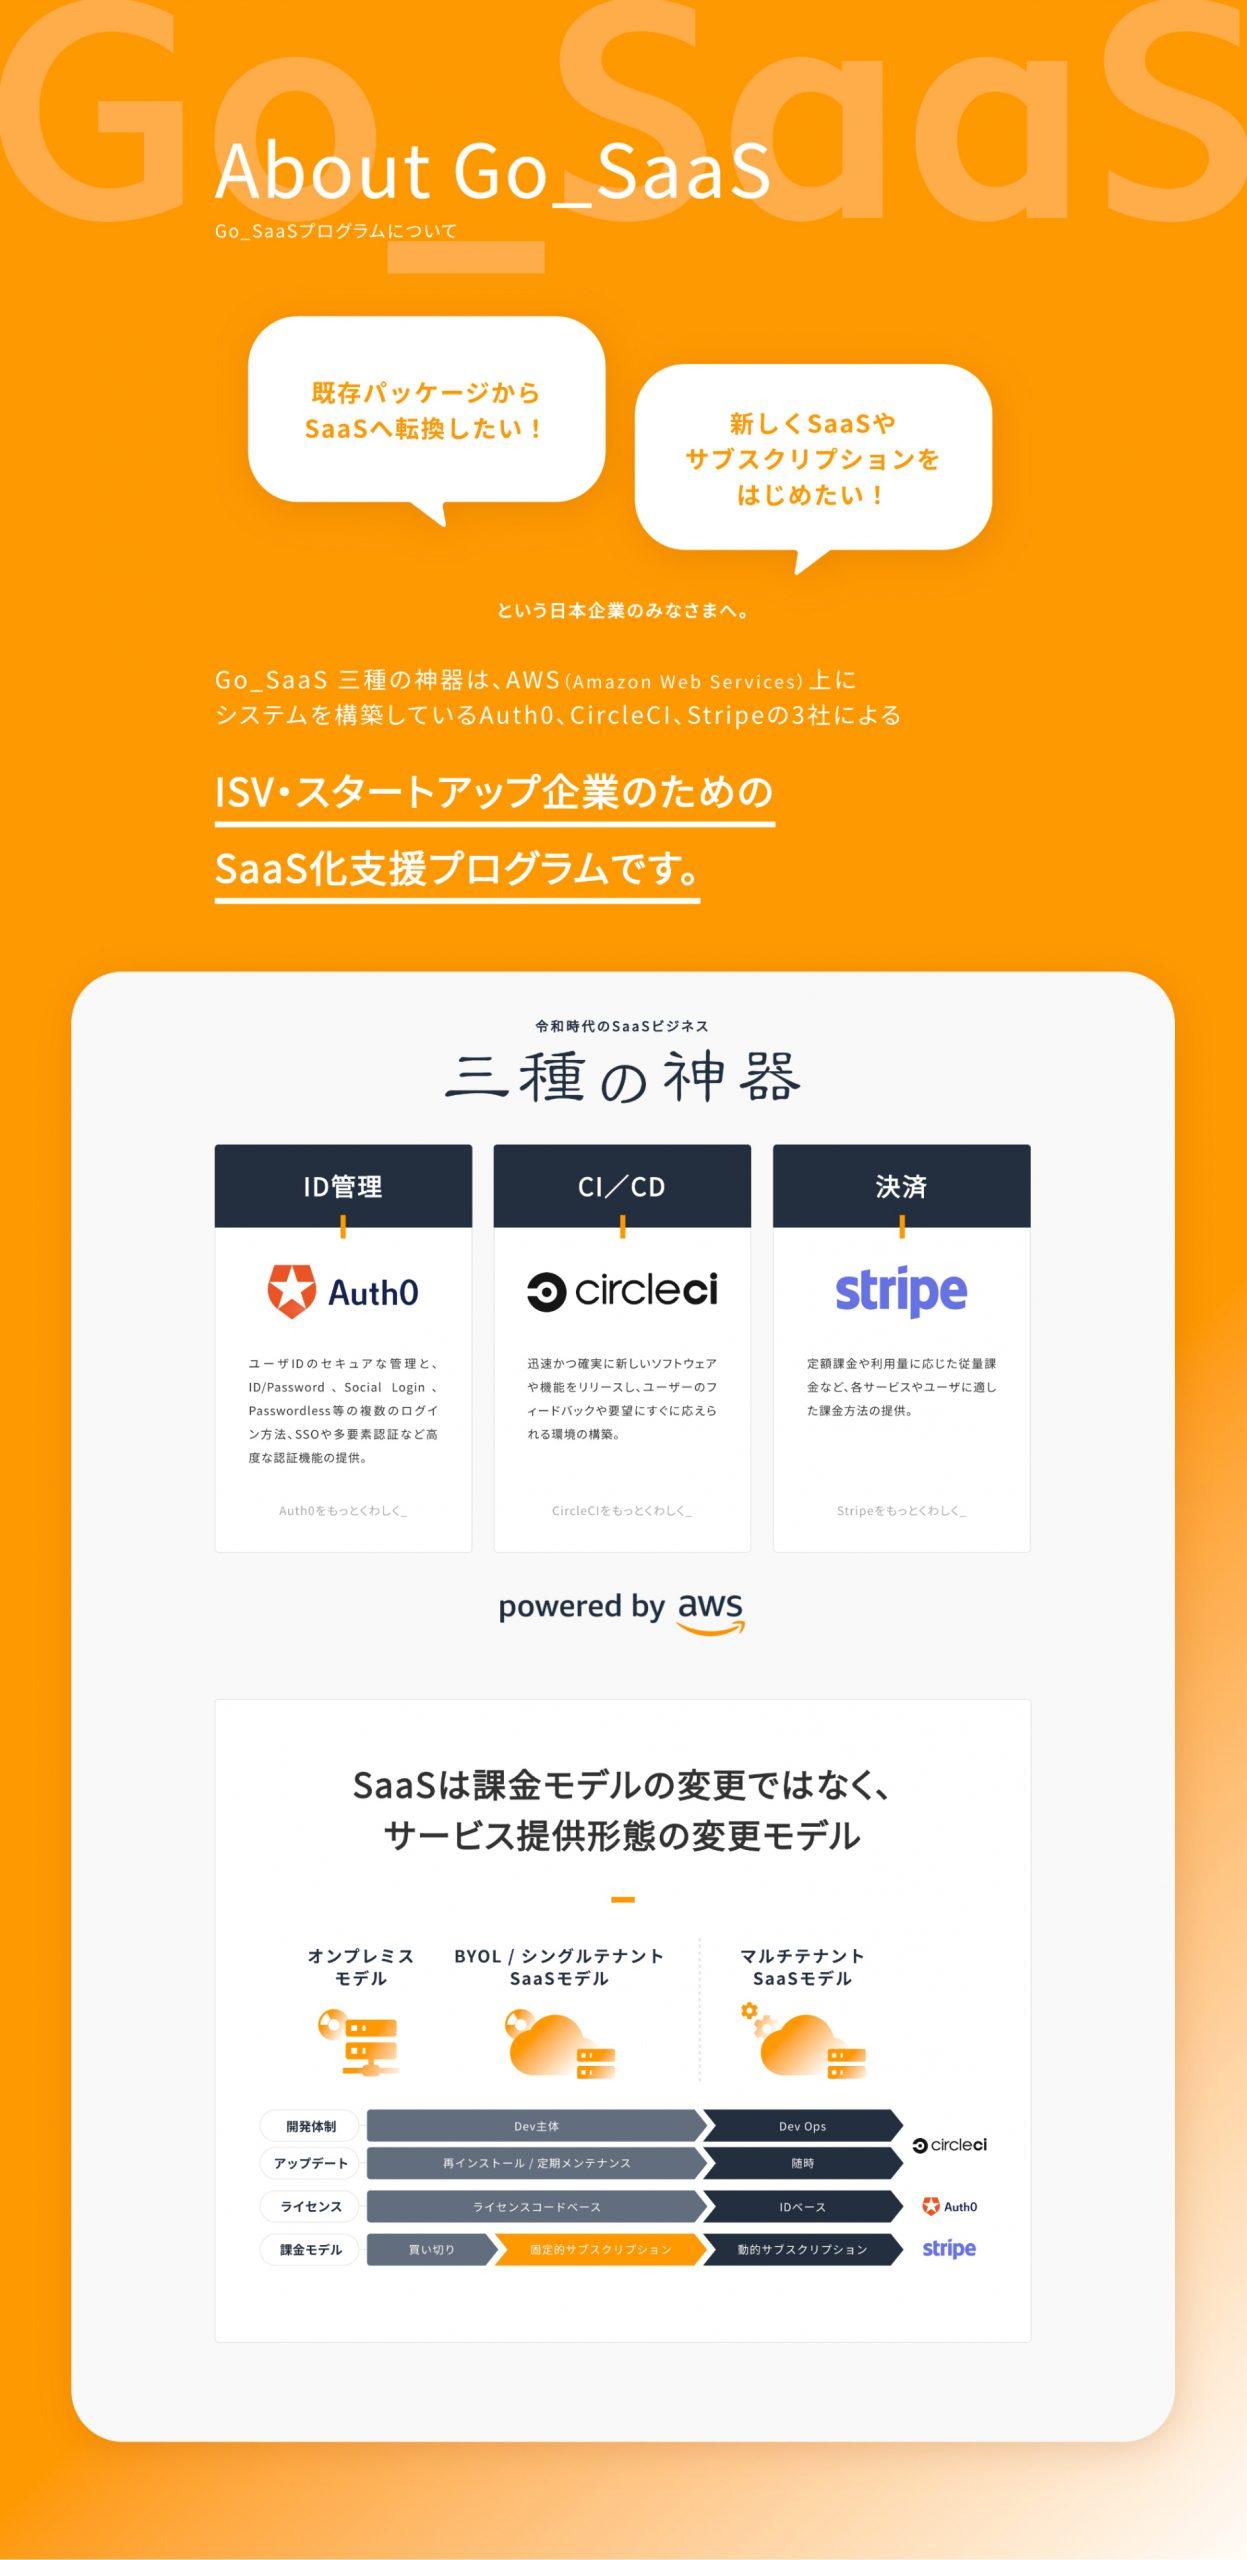 Go_SaaSのウェブサイトキャプチャ画像